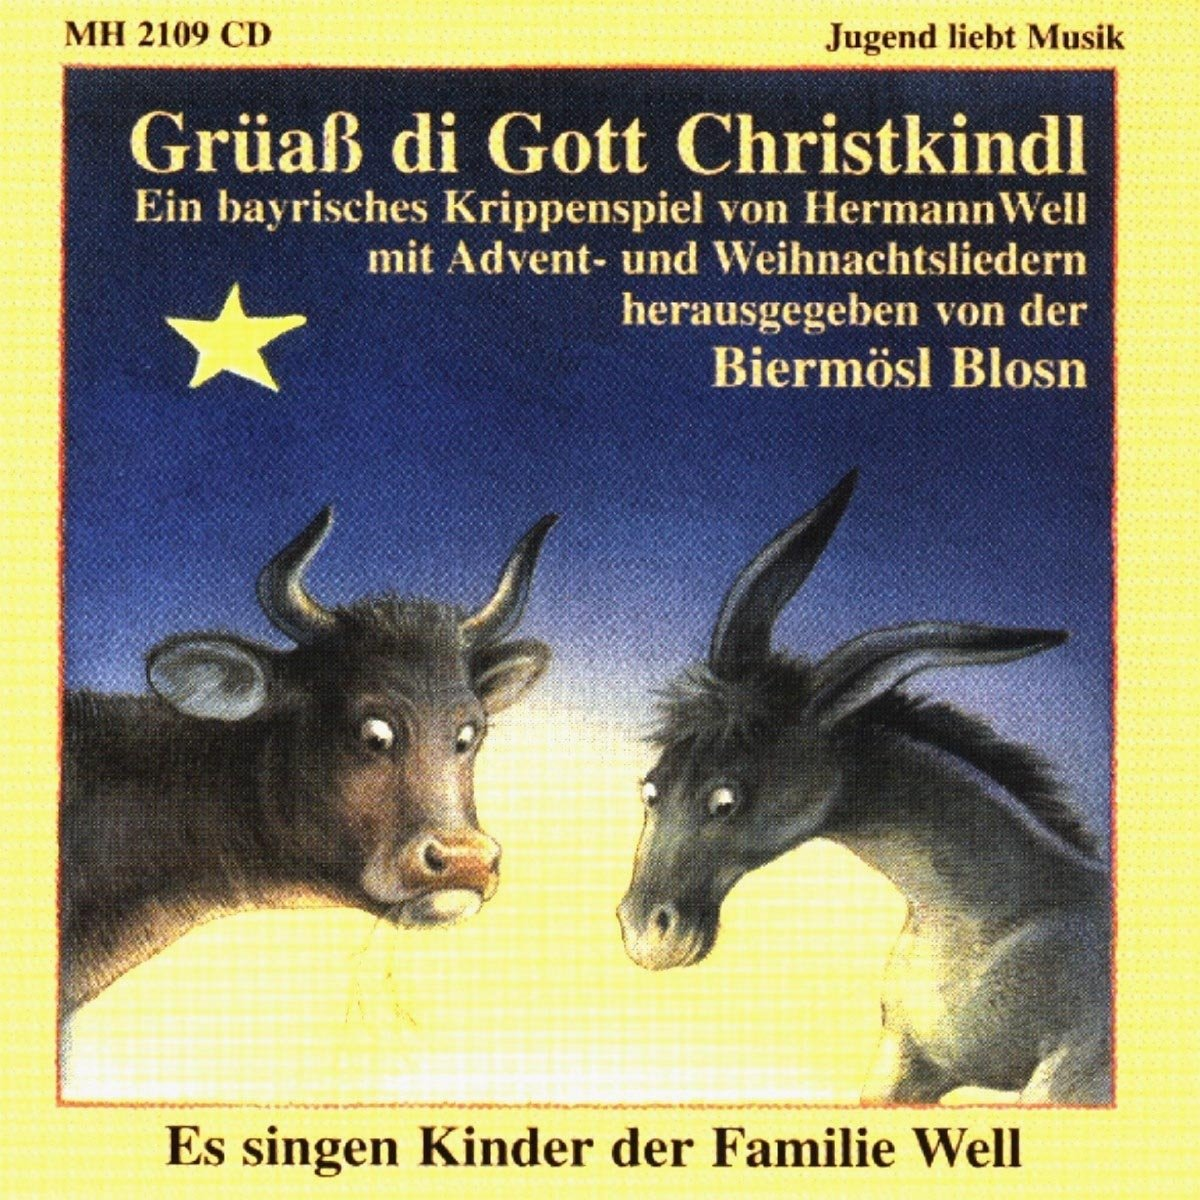 Grüass di Gott Christkindl - Biermösl Blosn: Amazon.de: Musik